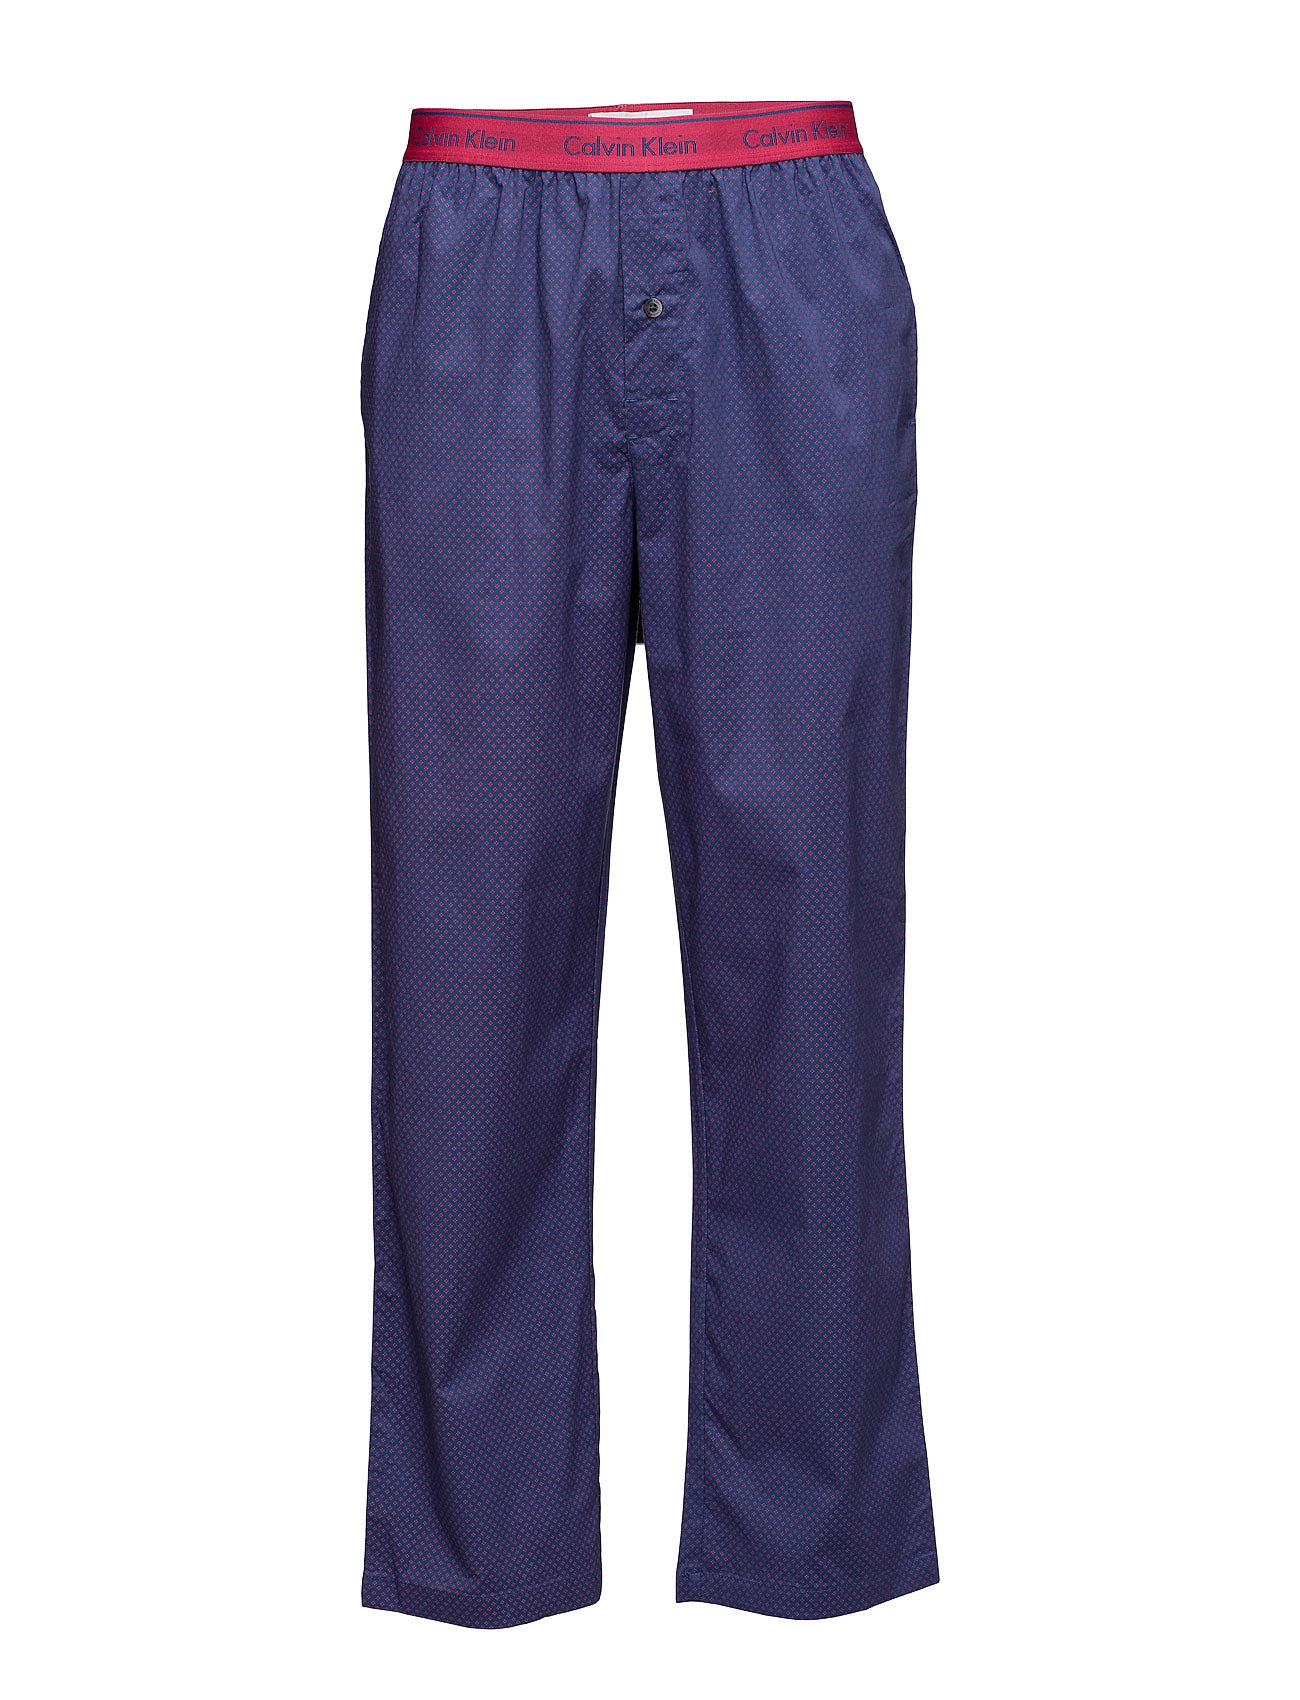 Pj Pant 9iu, L Calvin Klein Nattøj & Loungewear til Mænd i